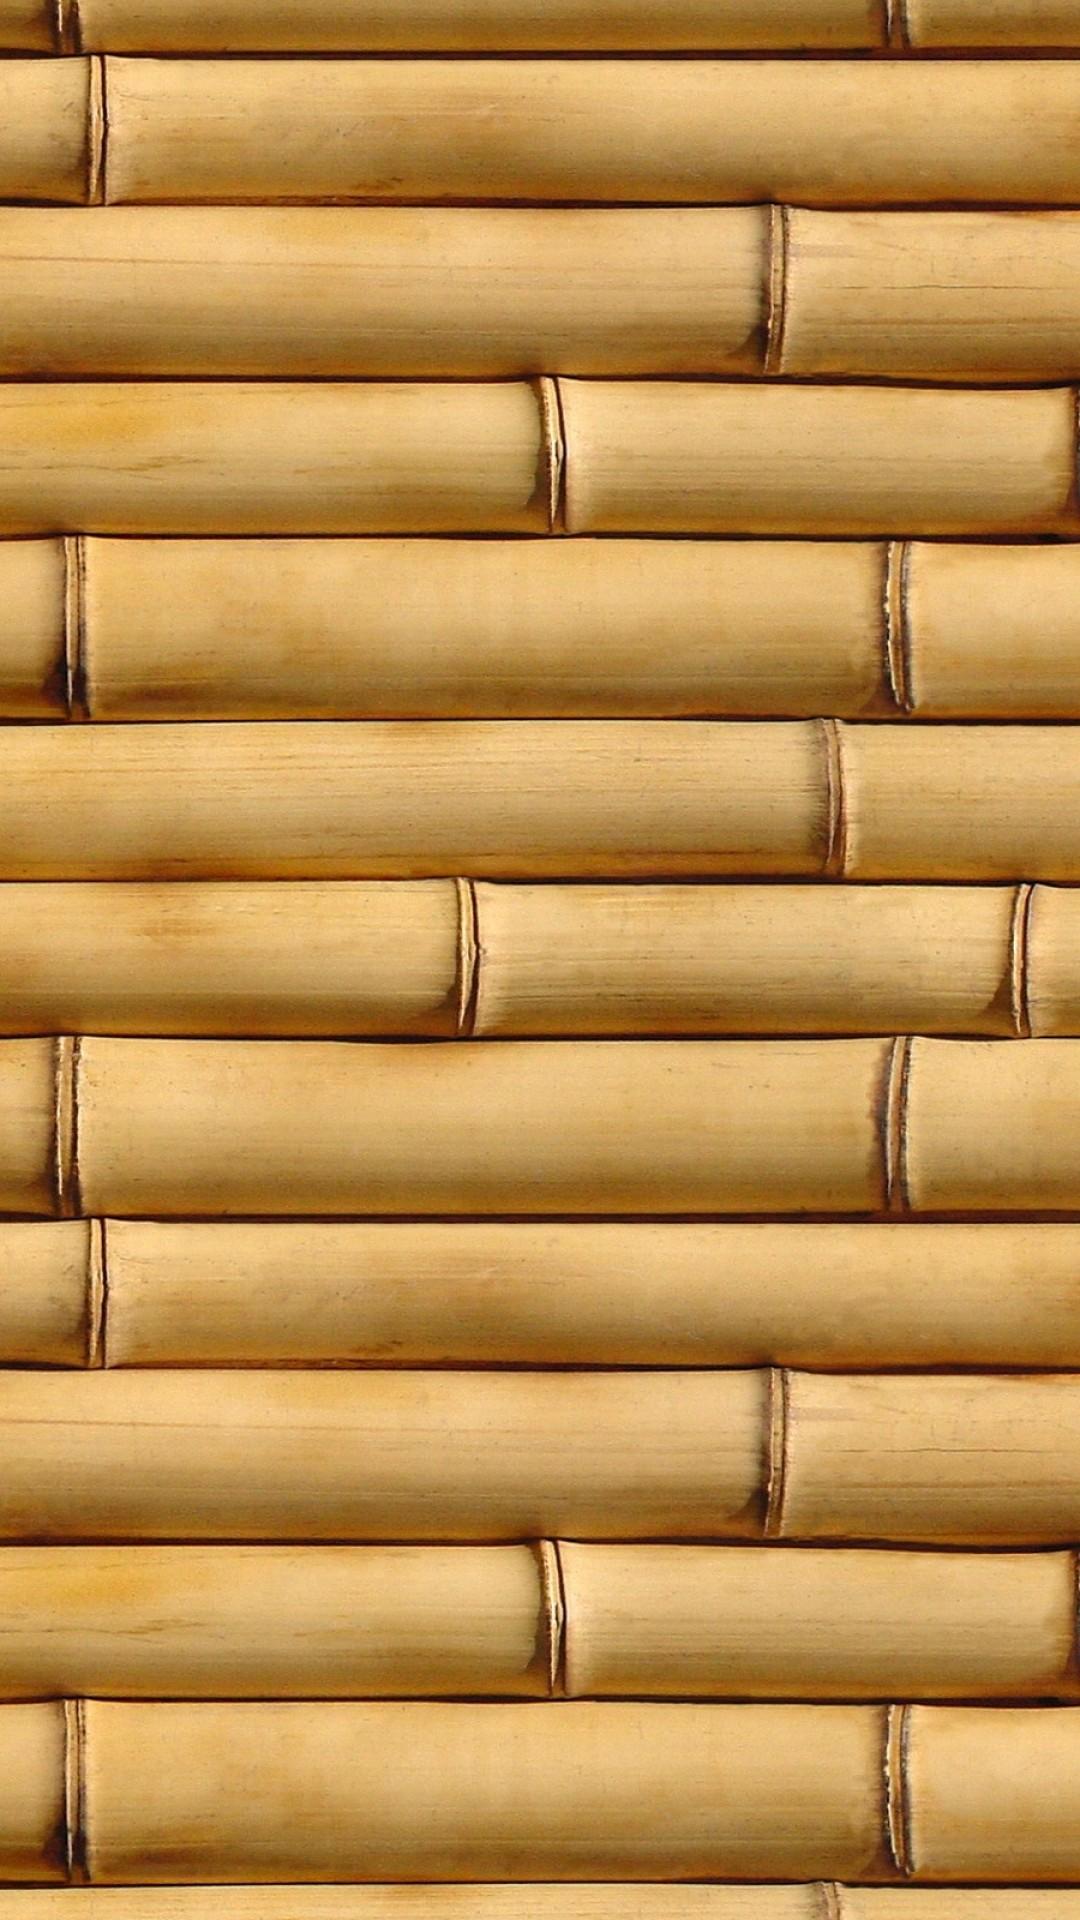 Bamboo Lined Smartphone Wallpaper Iphone Wallpaper